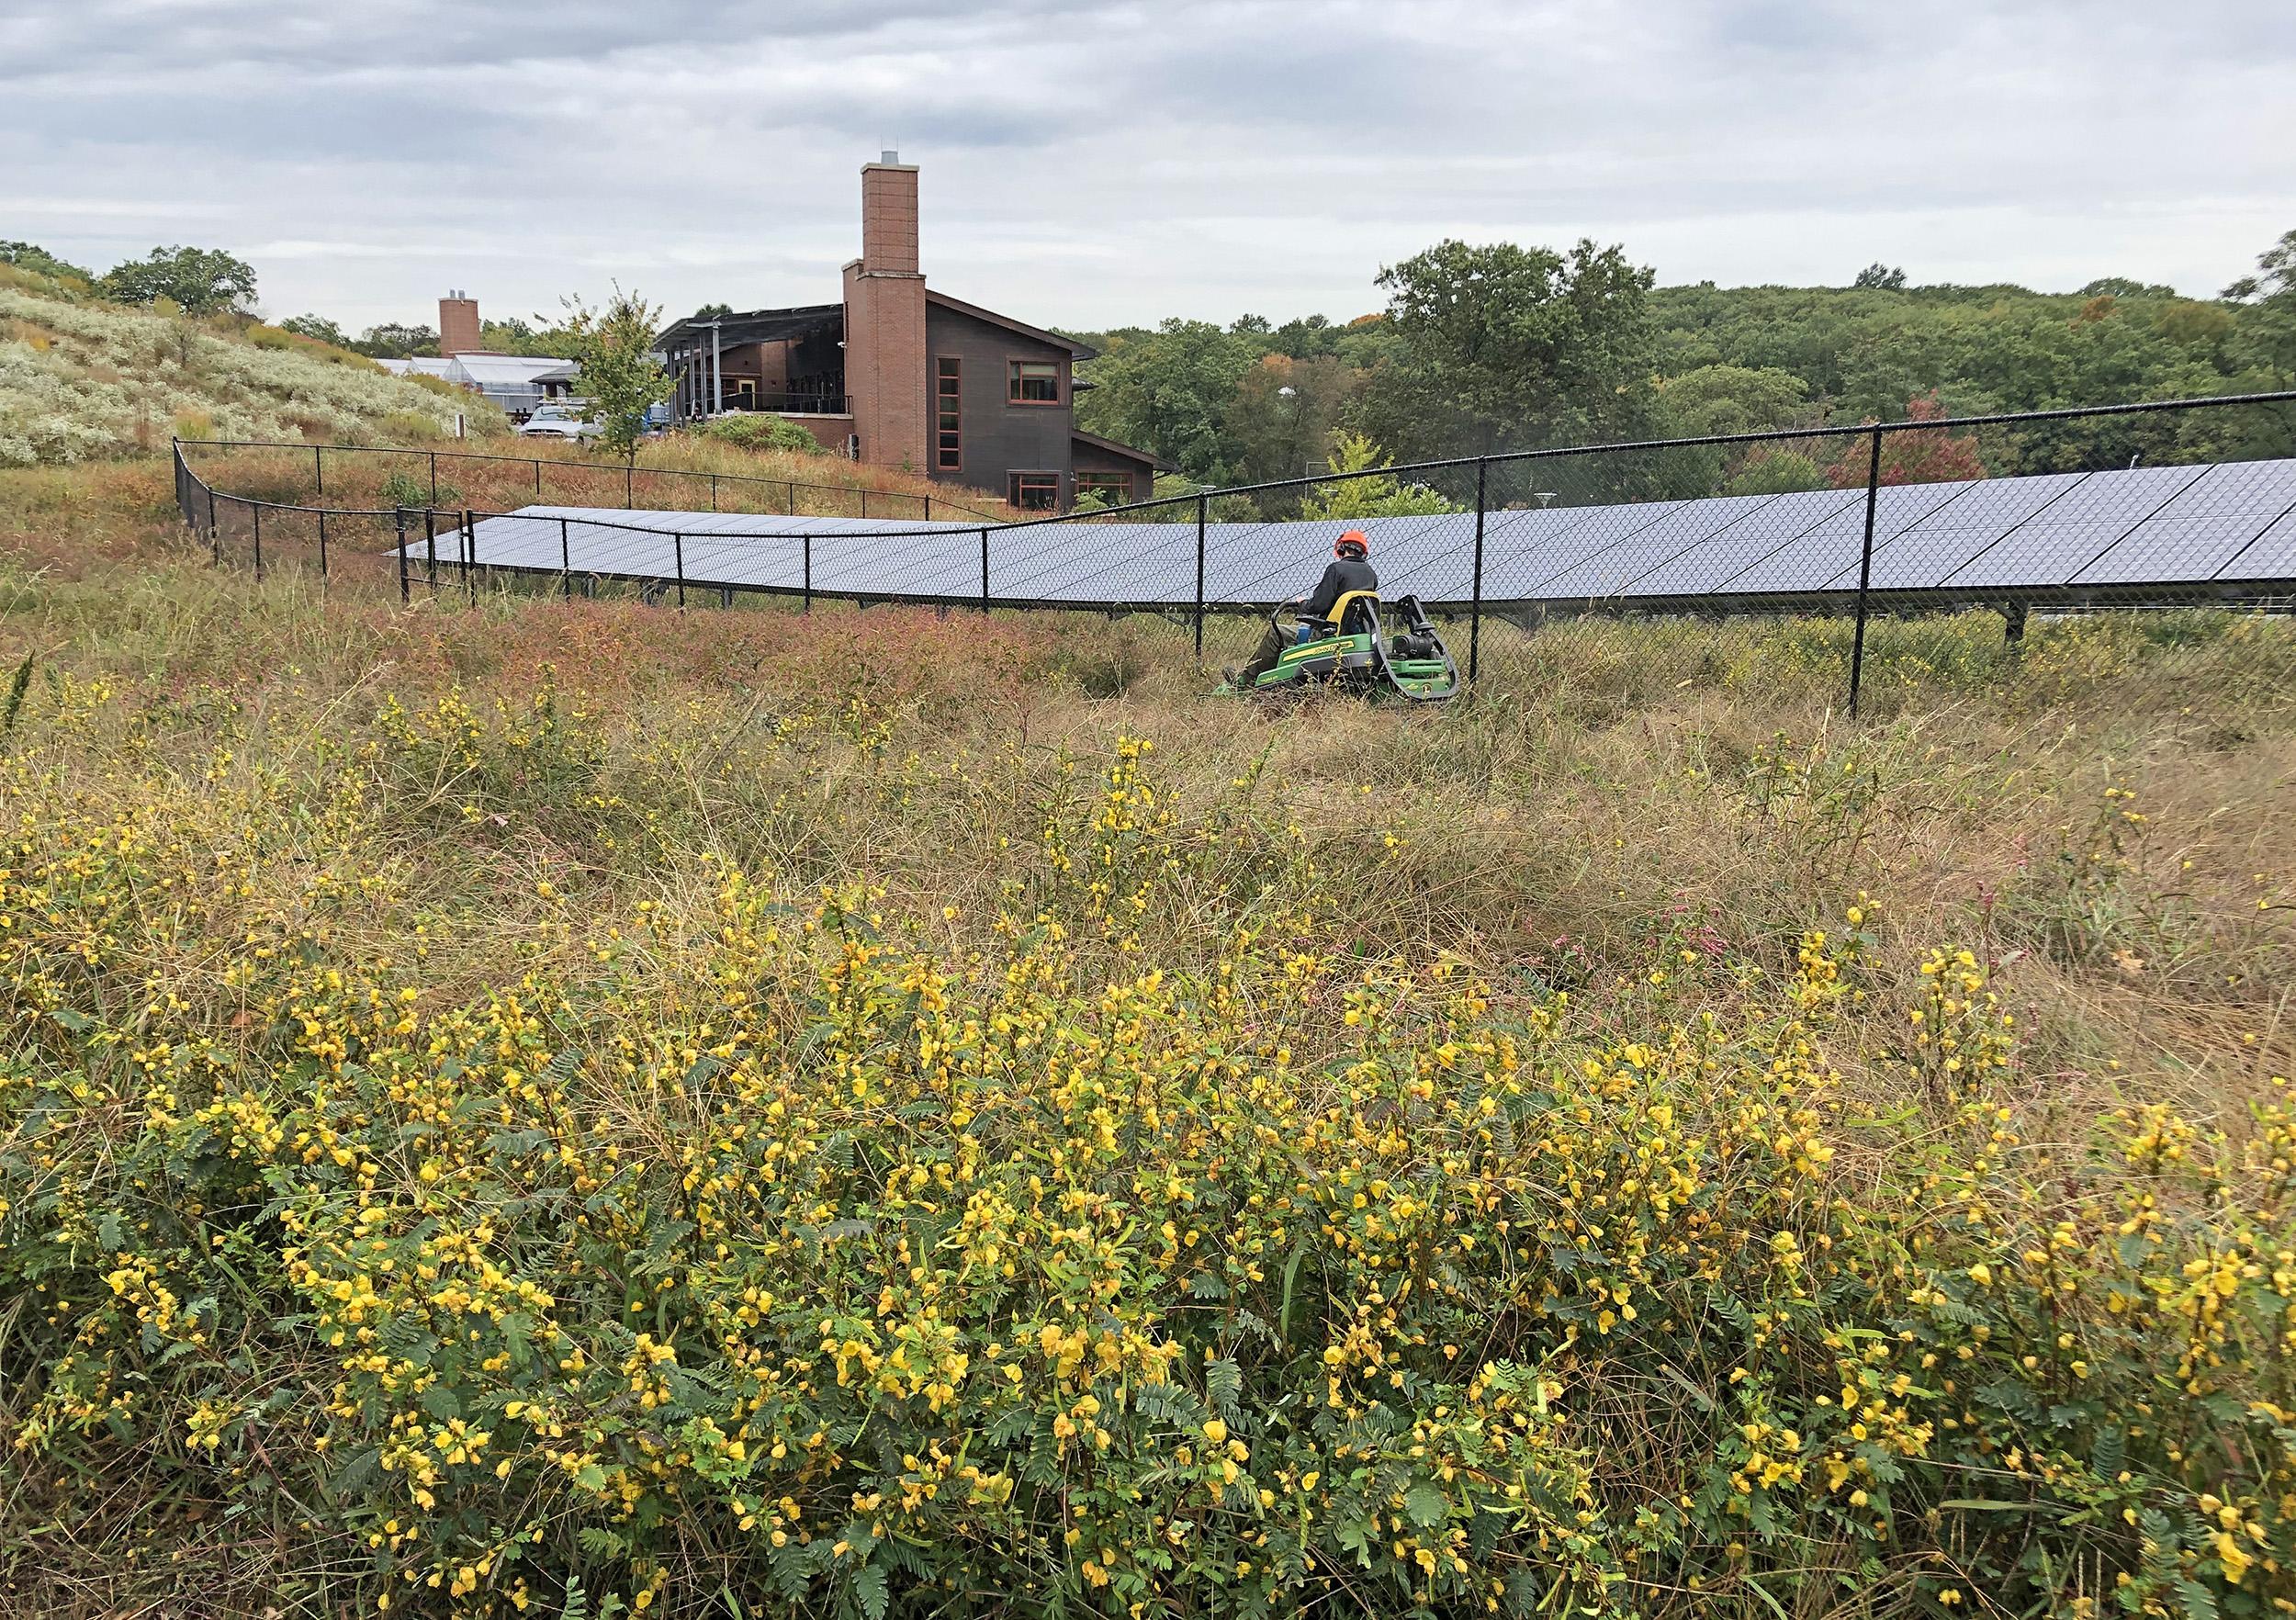 Mowing near the solar array